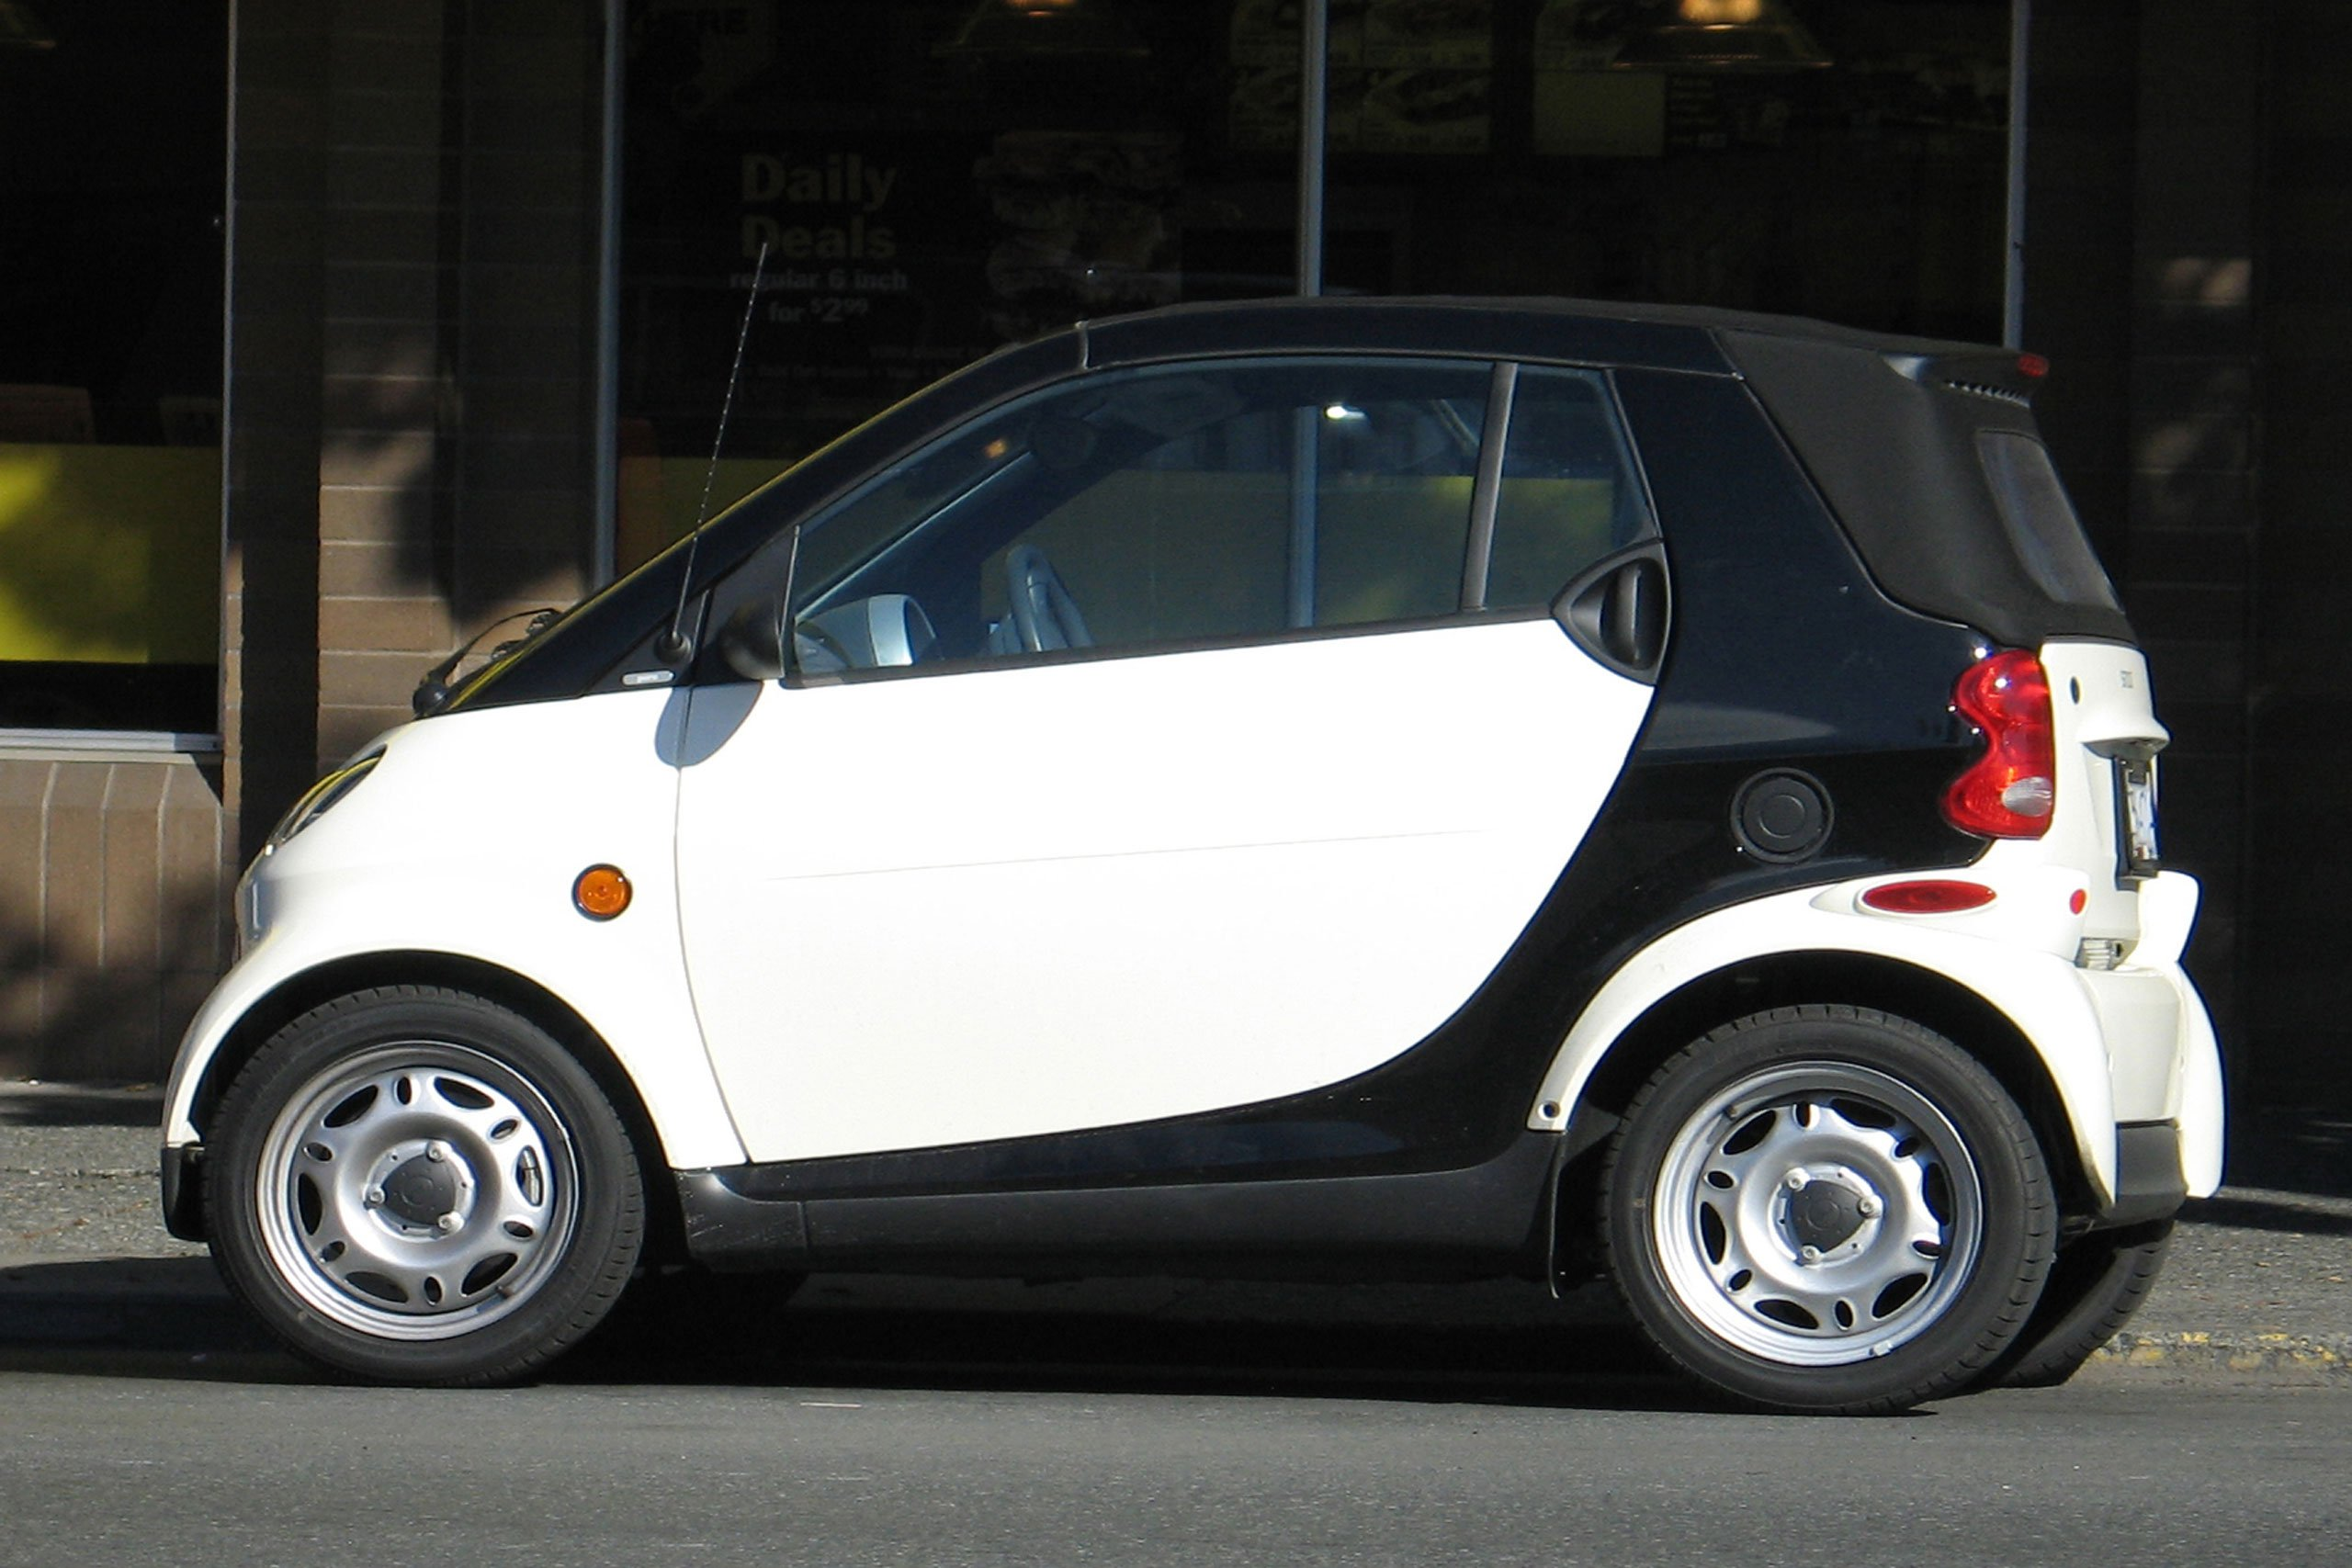 smart-car-1426512-2560x1707